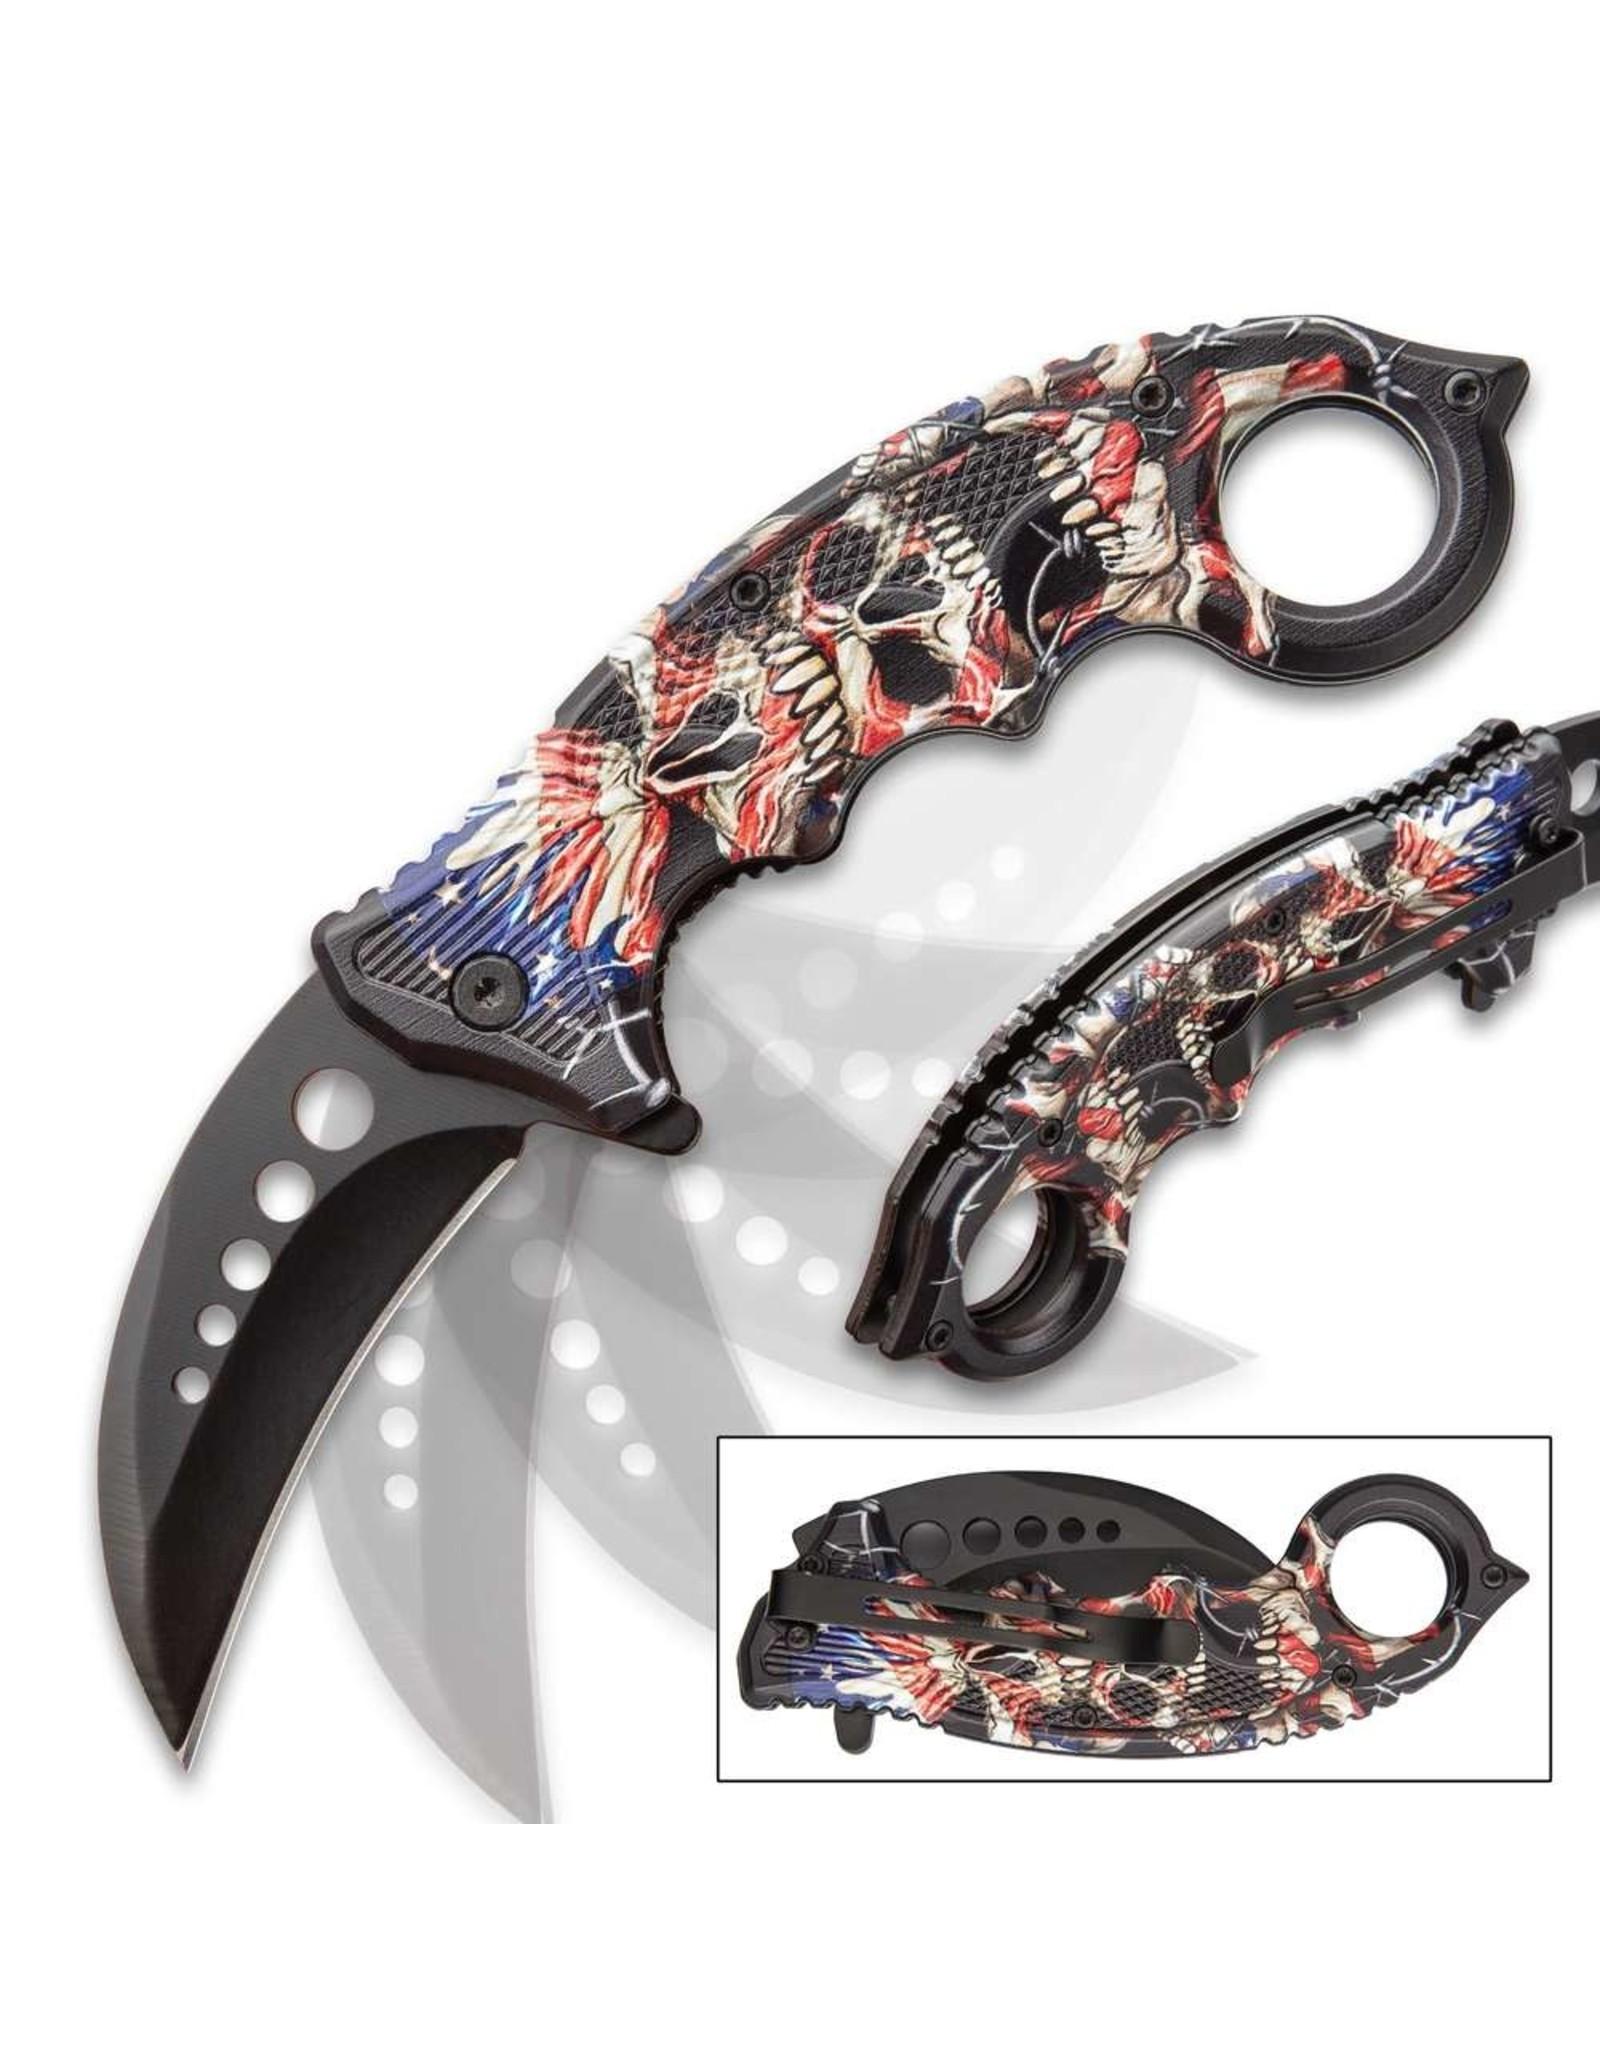 Liberty's Price Assisted Opening Karambit Knife